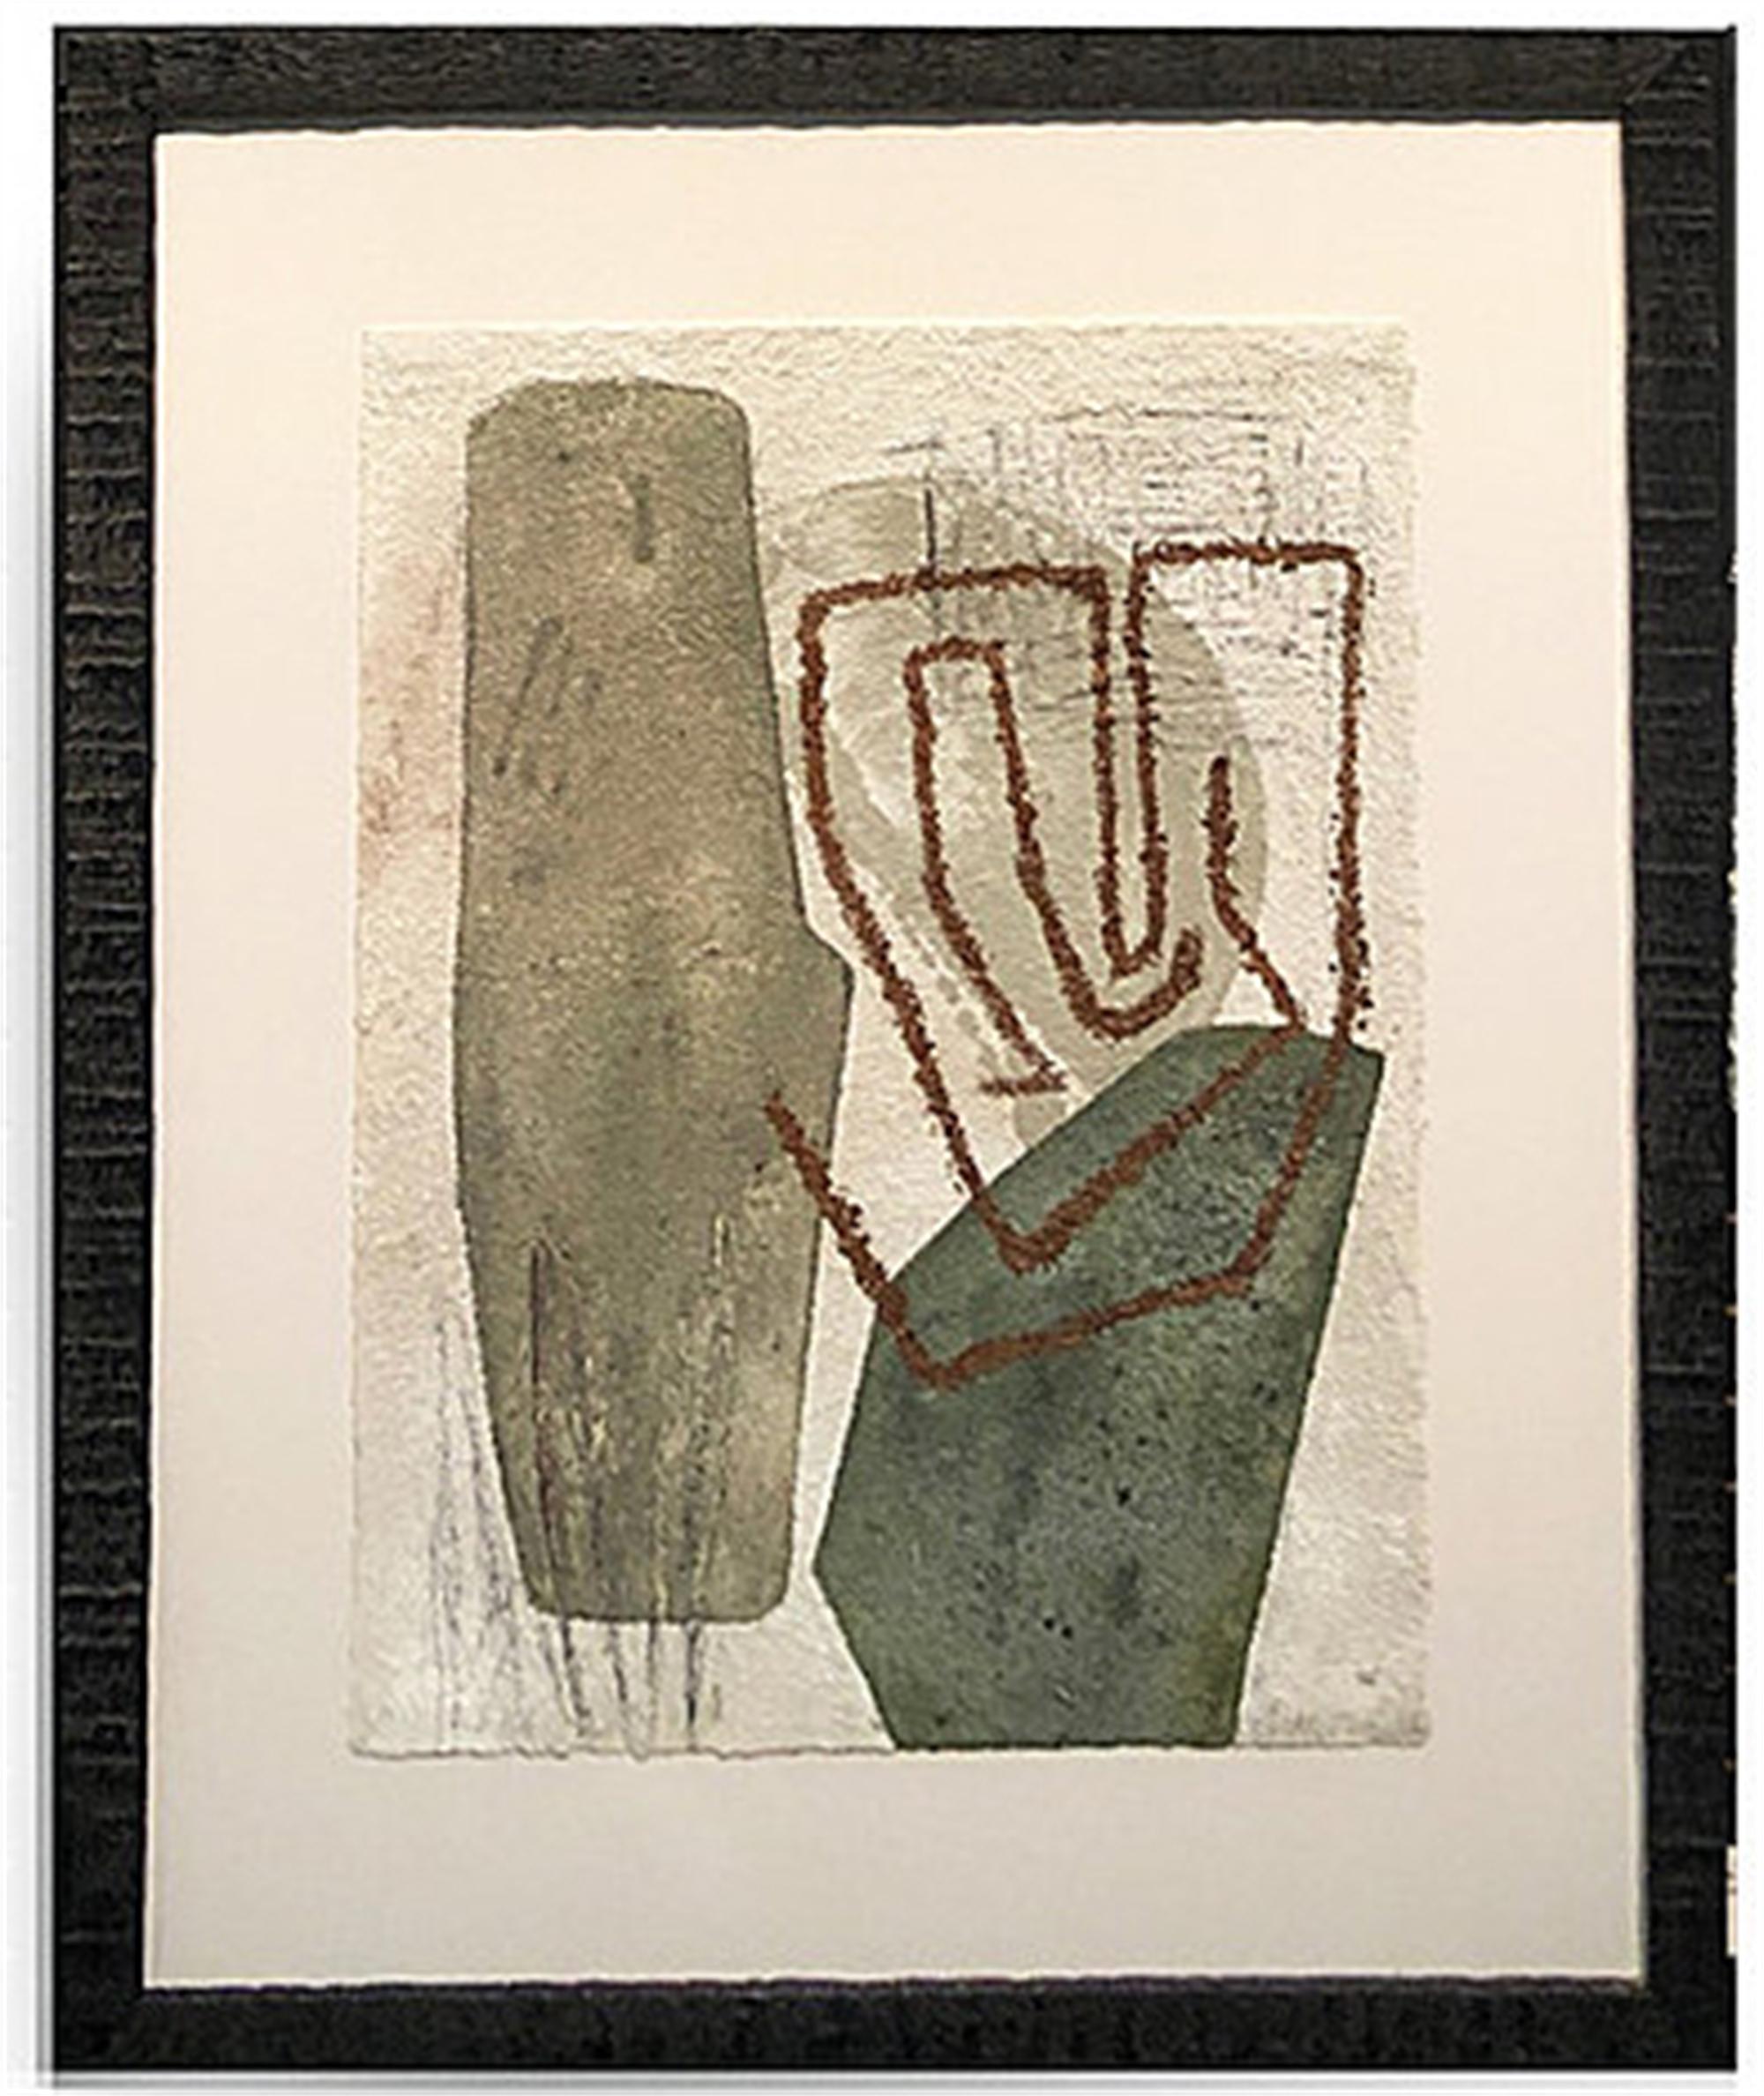 A Dollop of Uncertainty II by Stewart McDonald